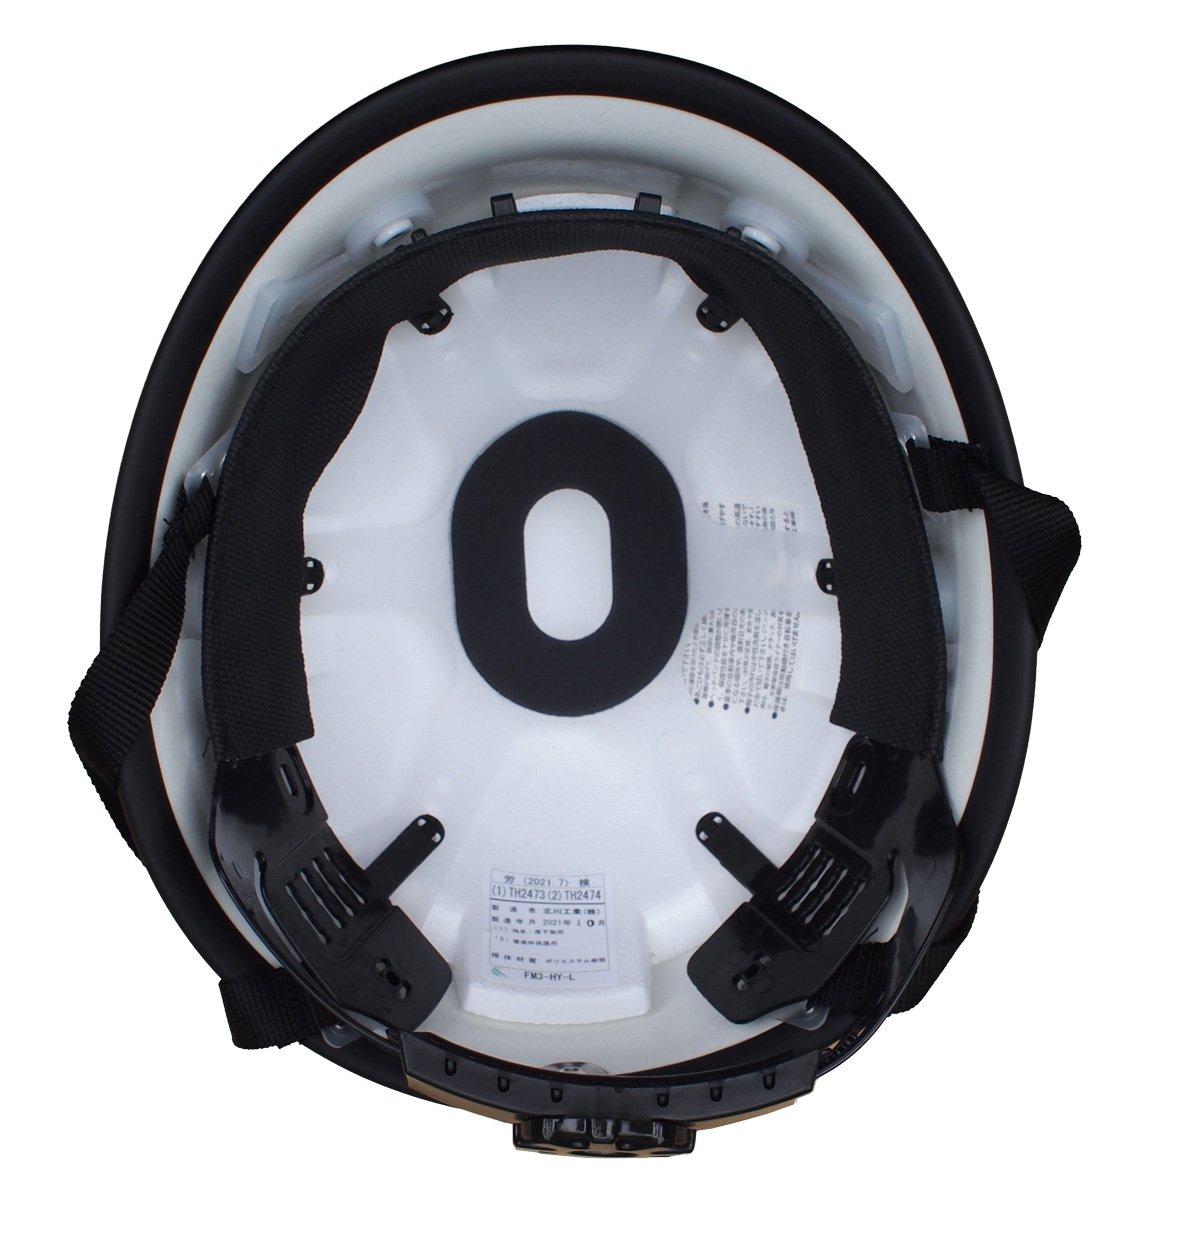 G2消防団ヘルメット【画像5】